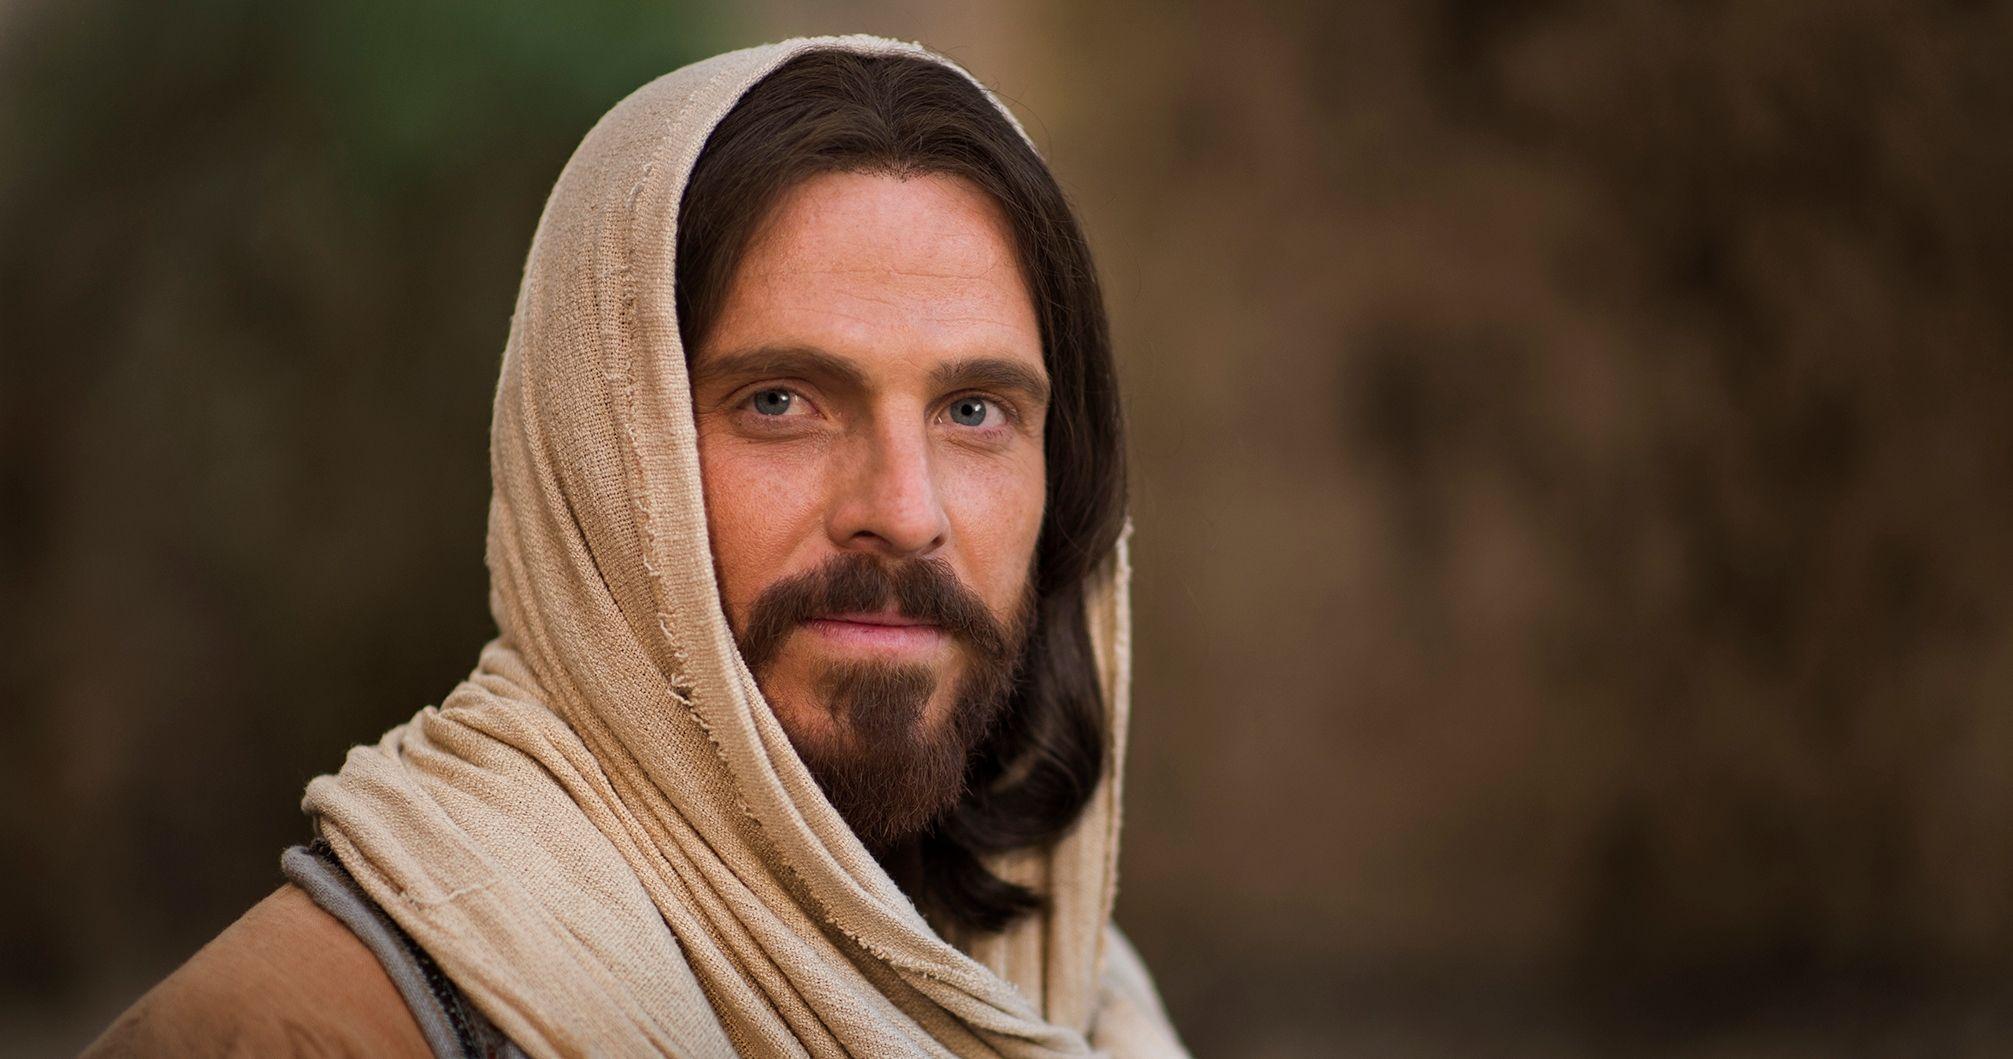 Image of Jesus Christ via Church of Jesus Christ.